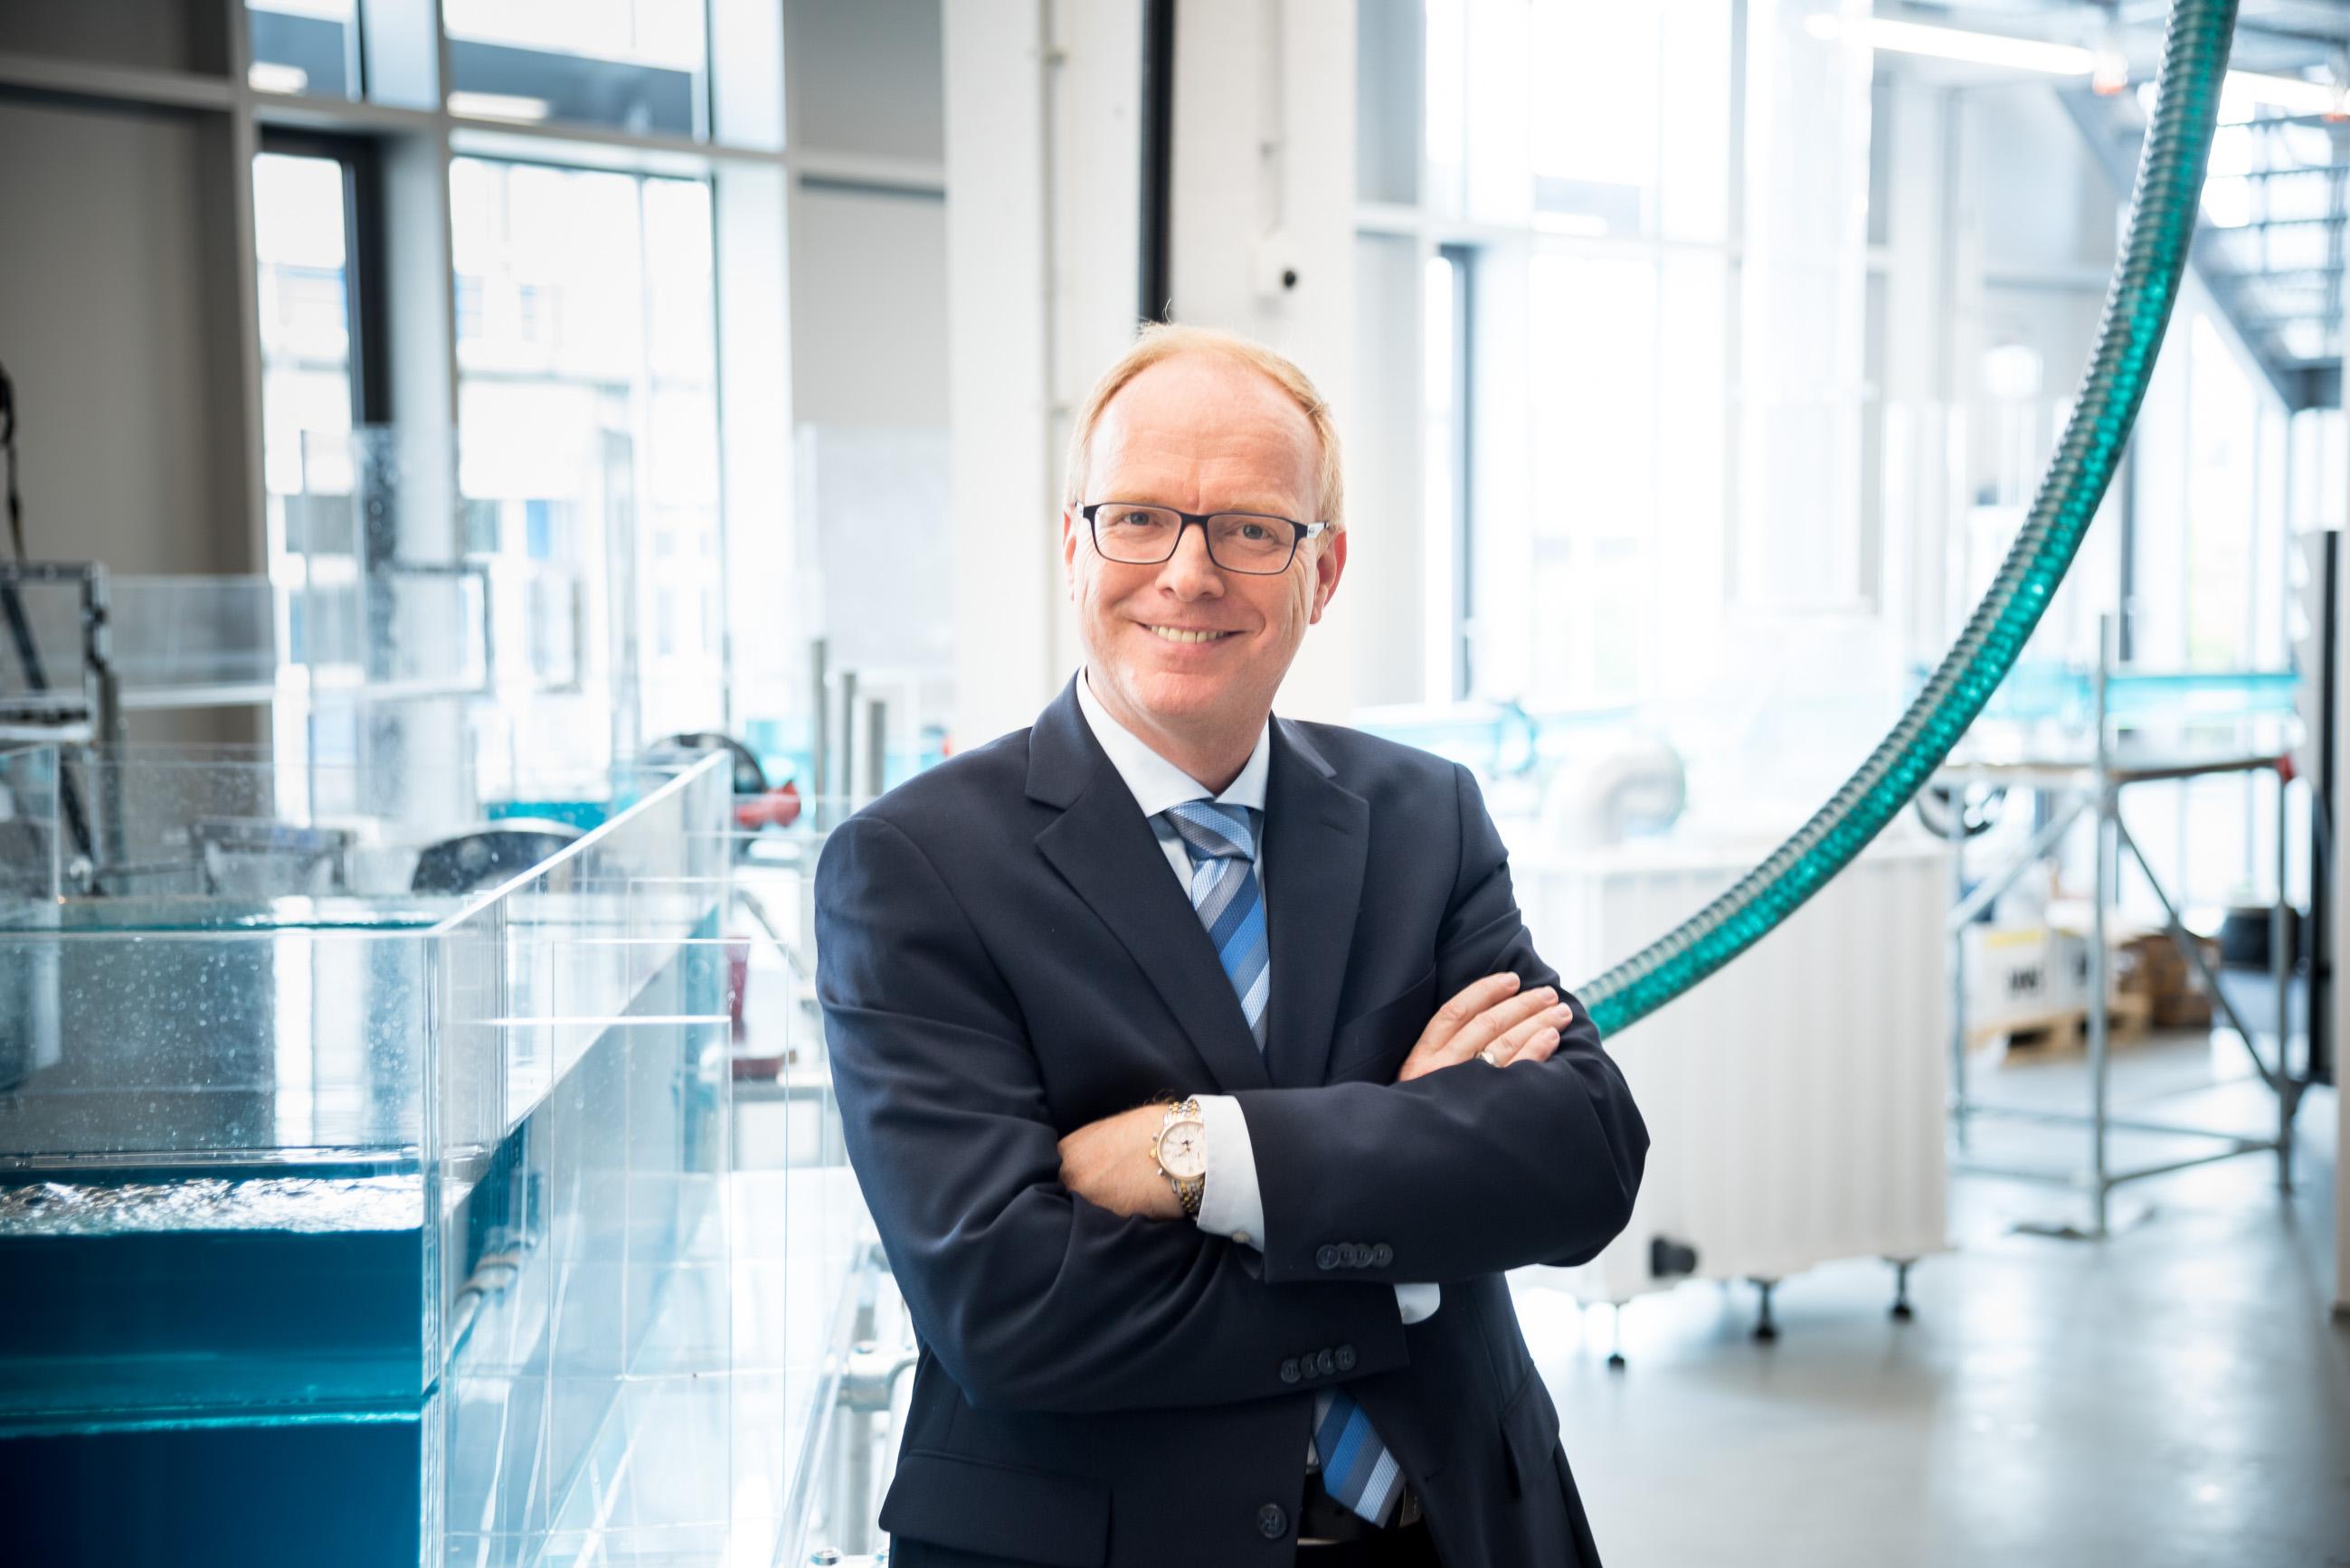 Professor des Jahres Prof. Dr. Helmut Grüning